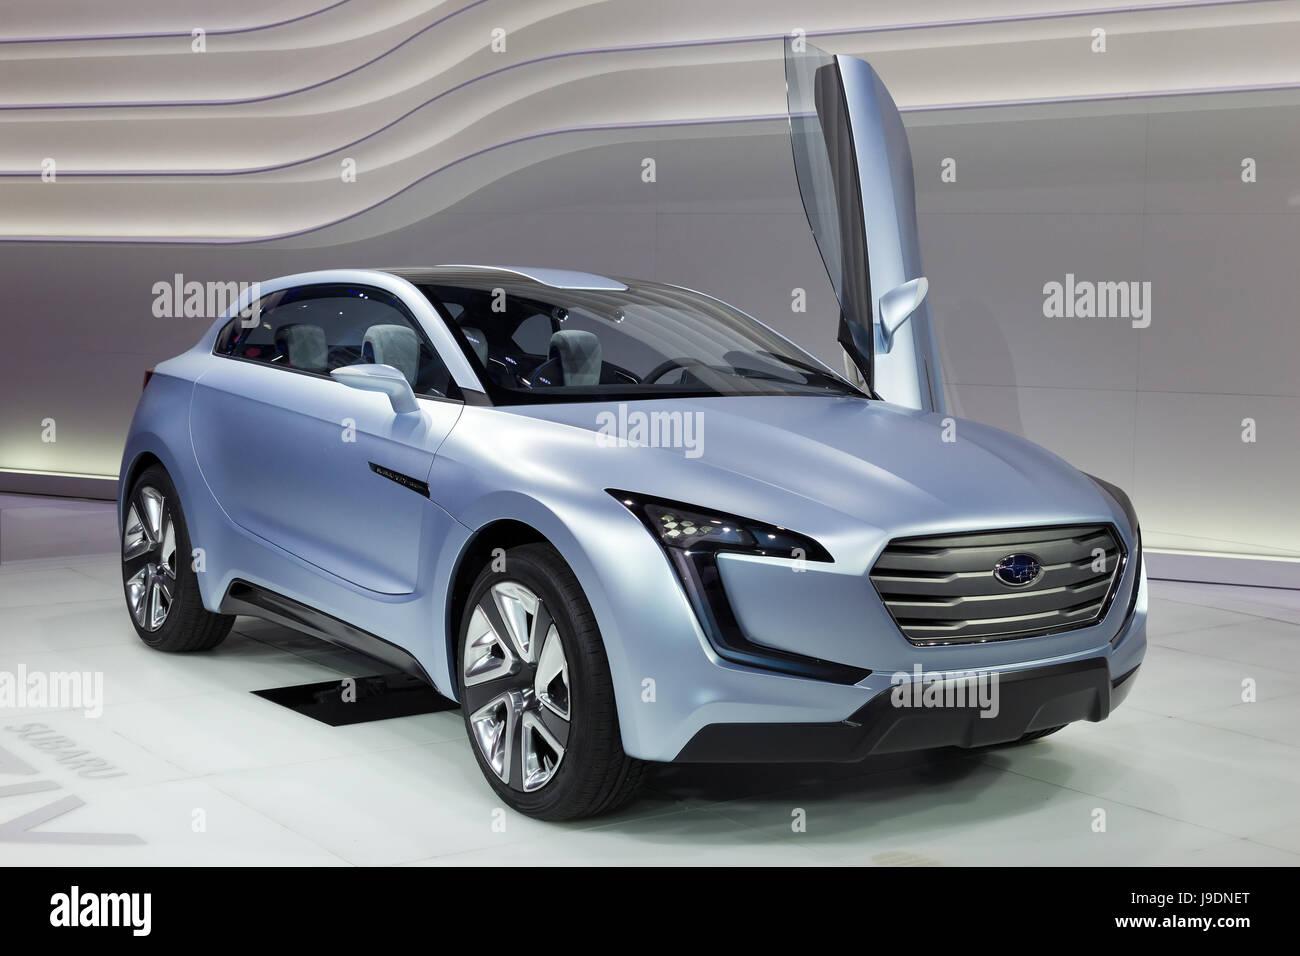 FRANKFURT, GERMANY - SEP 13: Subaru concept car Viziv at the IAA International Automobile Exhibition on Sep 13, - Stock Image